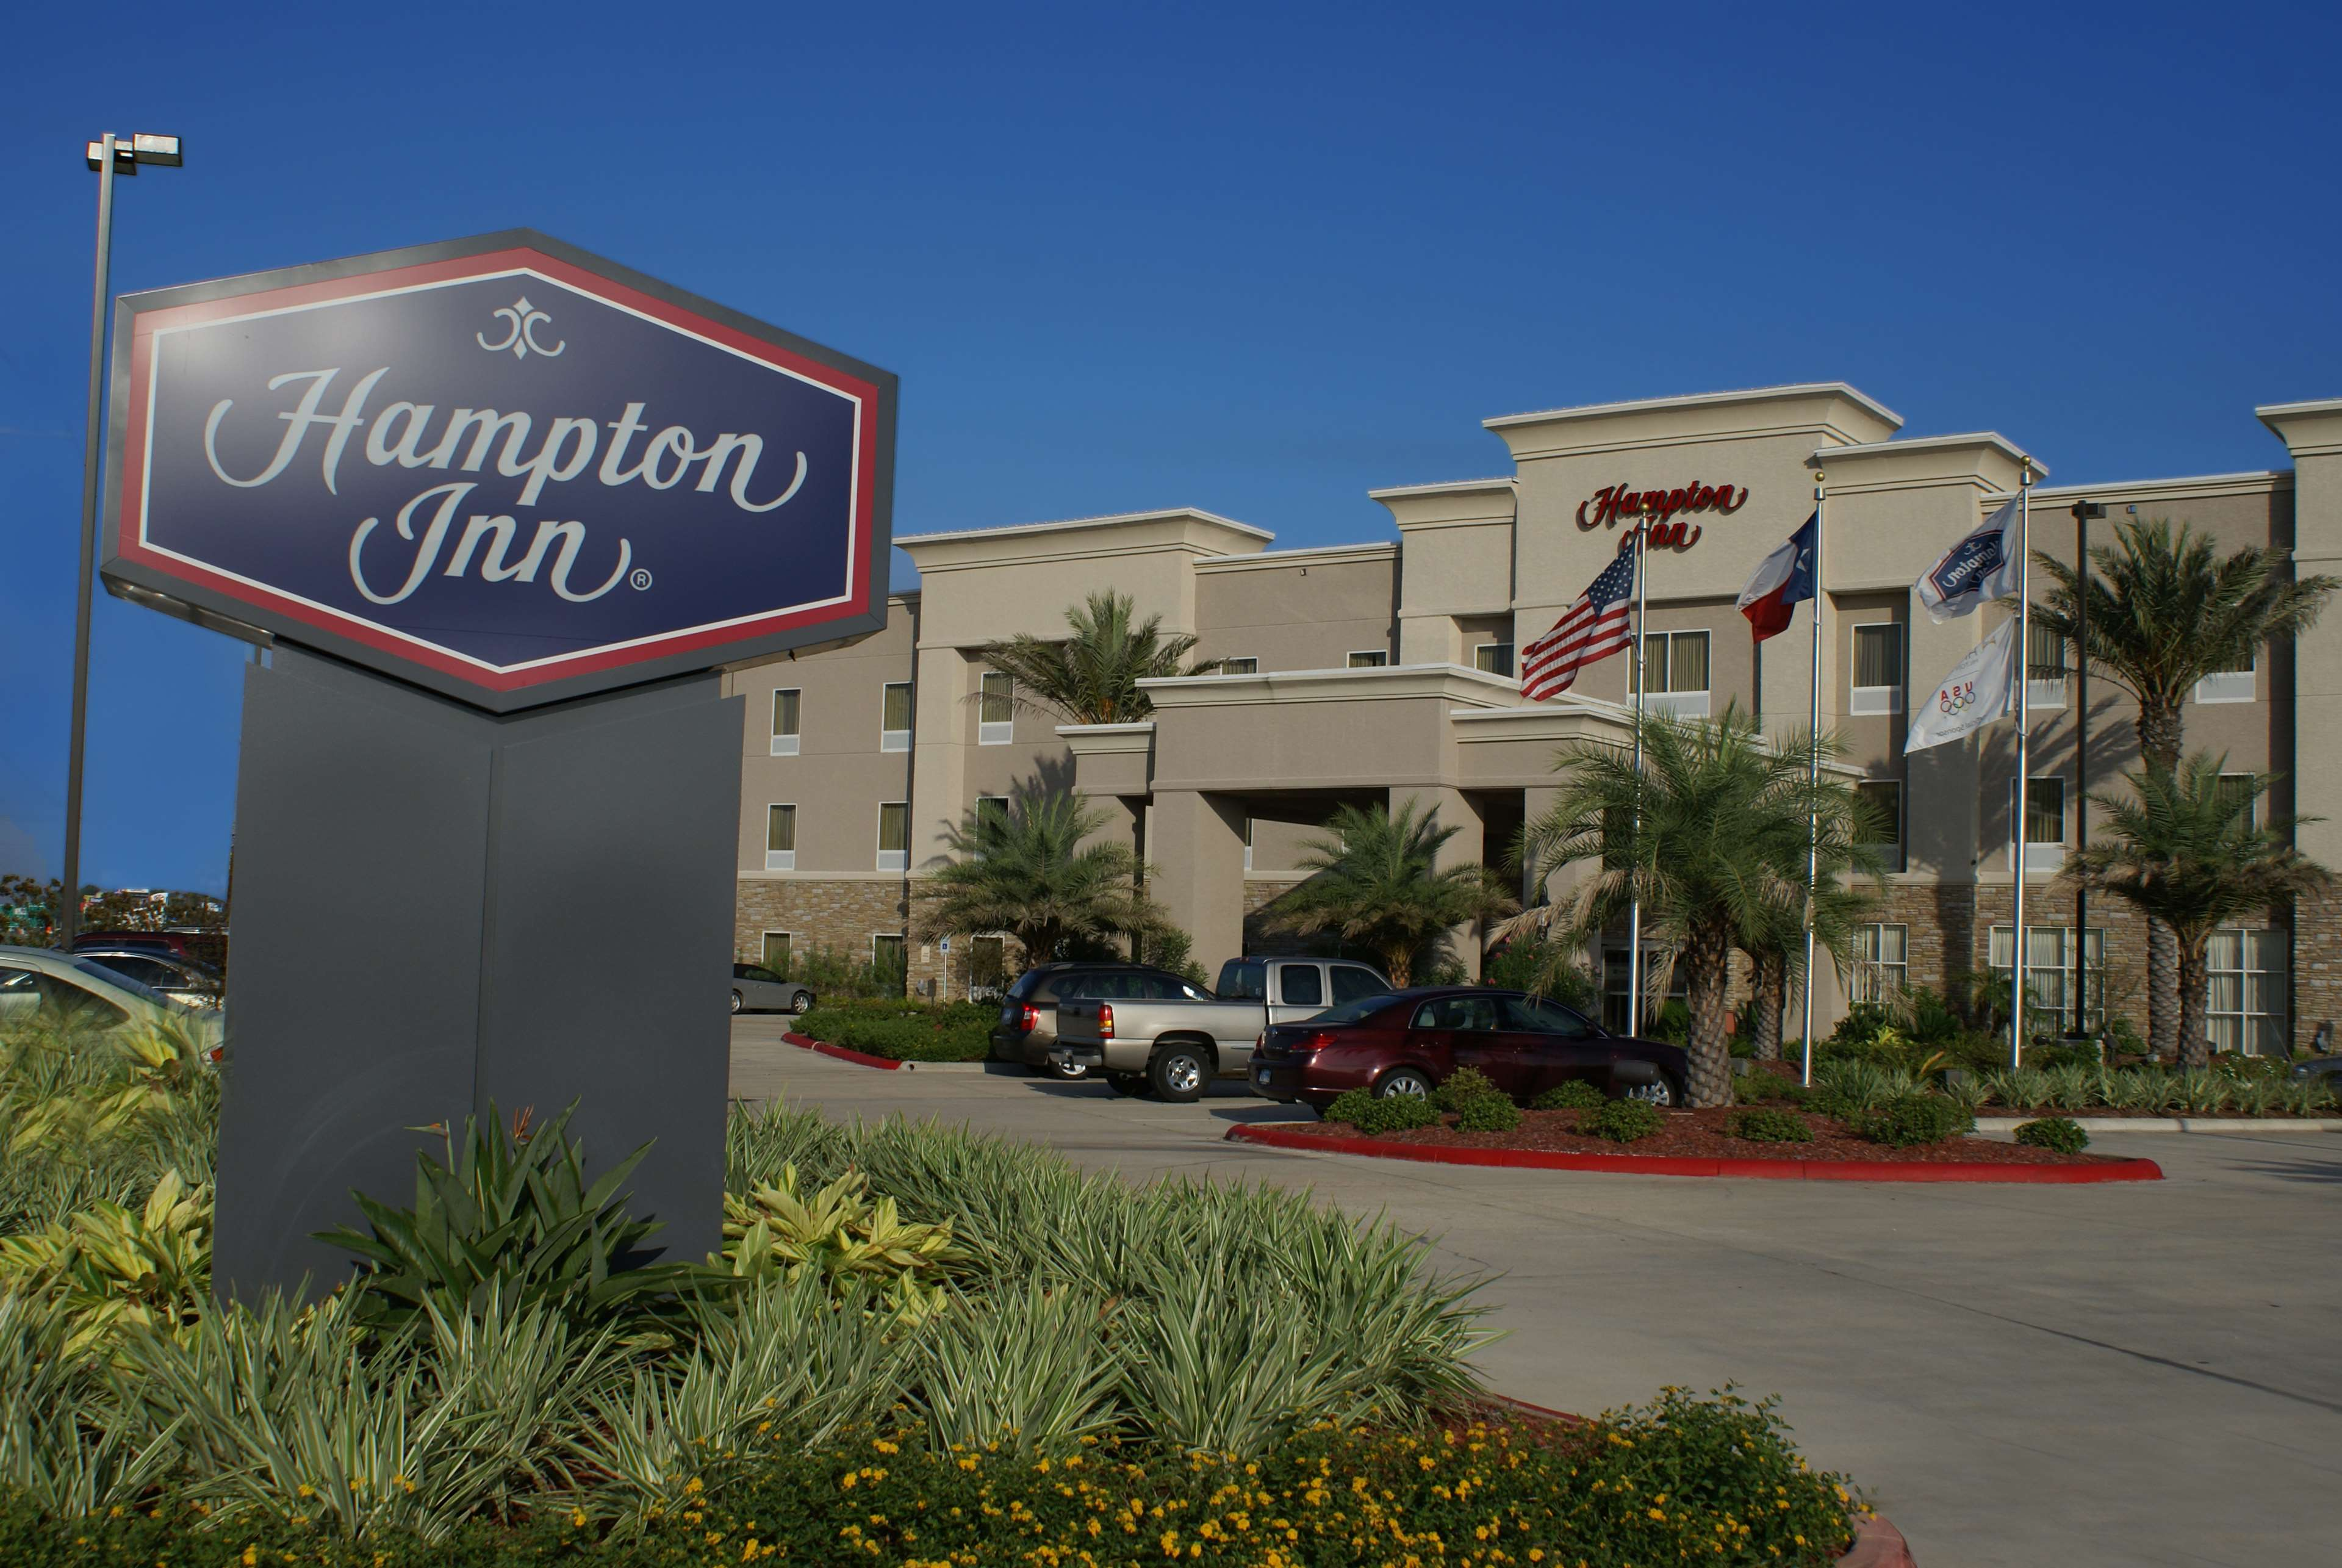 Hampton Inn Orange image 4